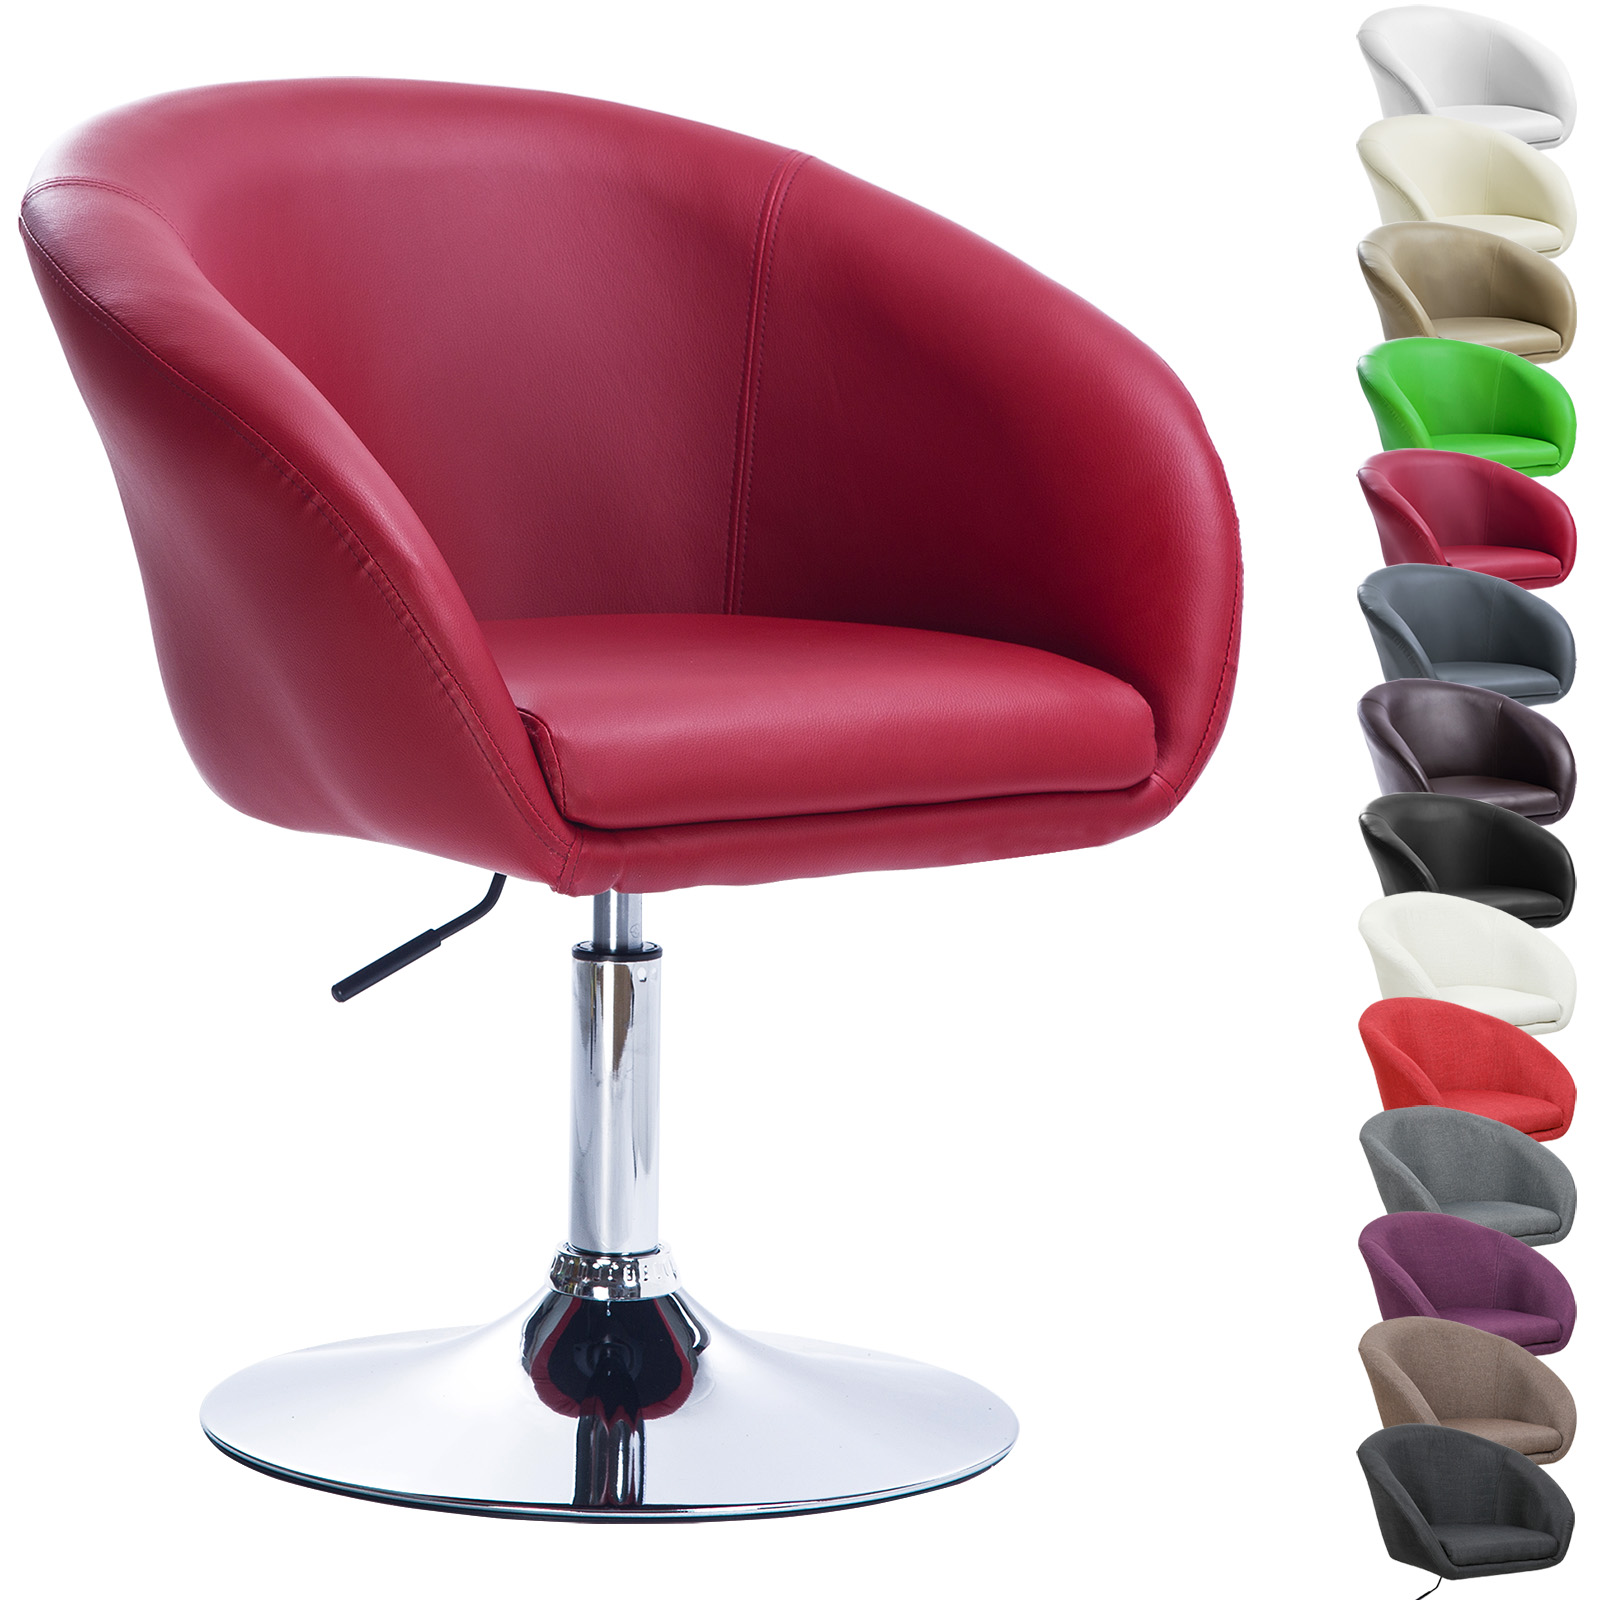 barhocker 2er barst hle tresenhocker stuhl hocker kunstleder sitz bordeaux 156 ebay. Black Bedroom Furniture Sets. Home Design Ideas